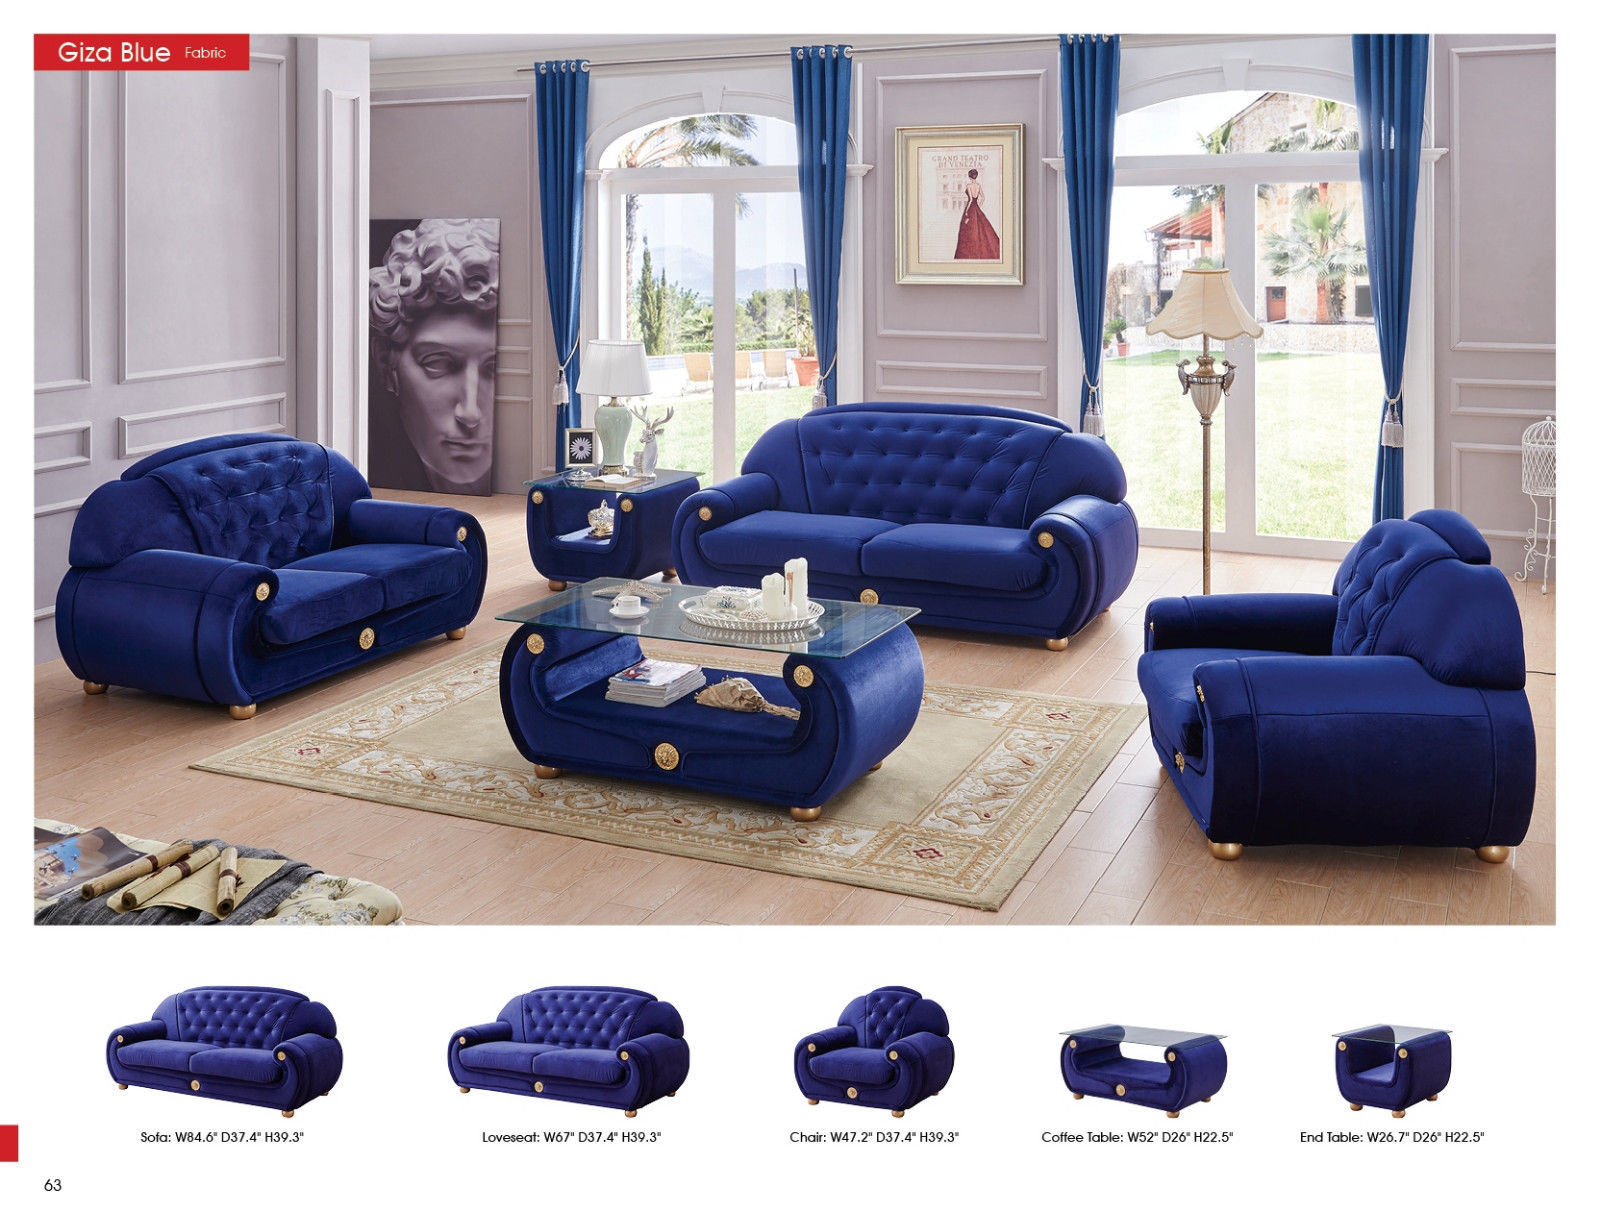 ESF Giza Microfiber Living Room Sofa Dark Blue Chic Contemporary Style